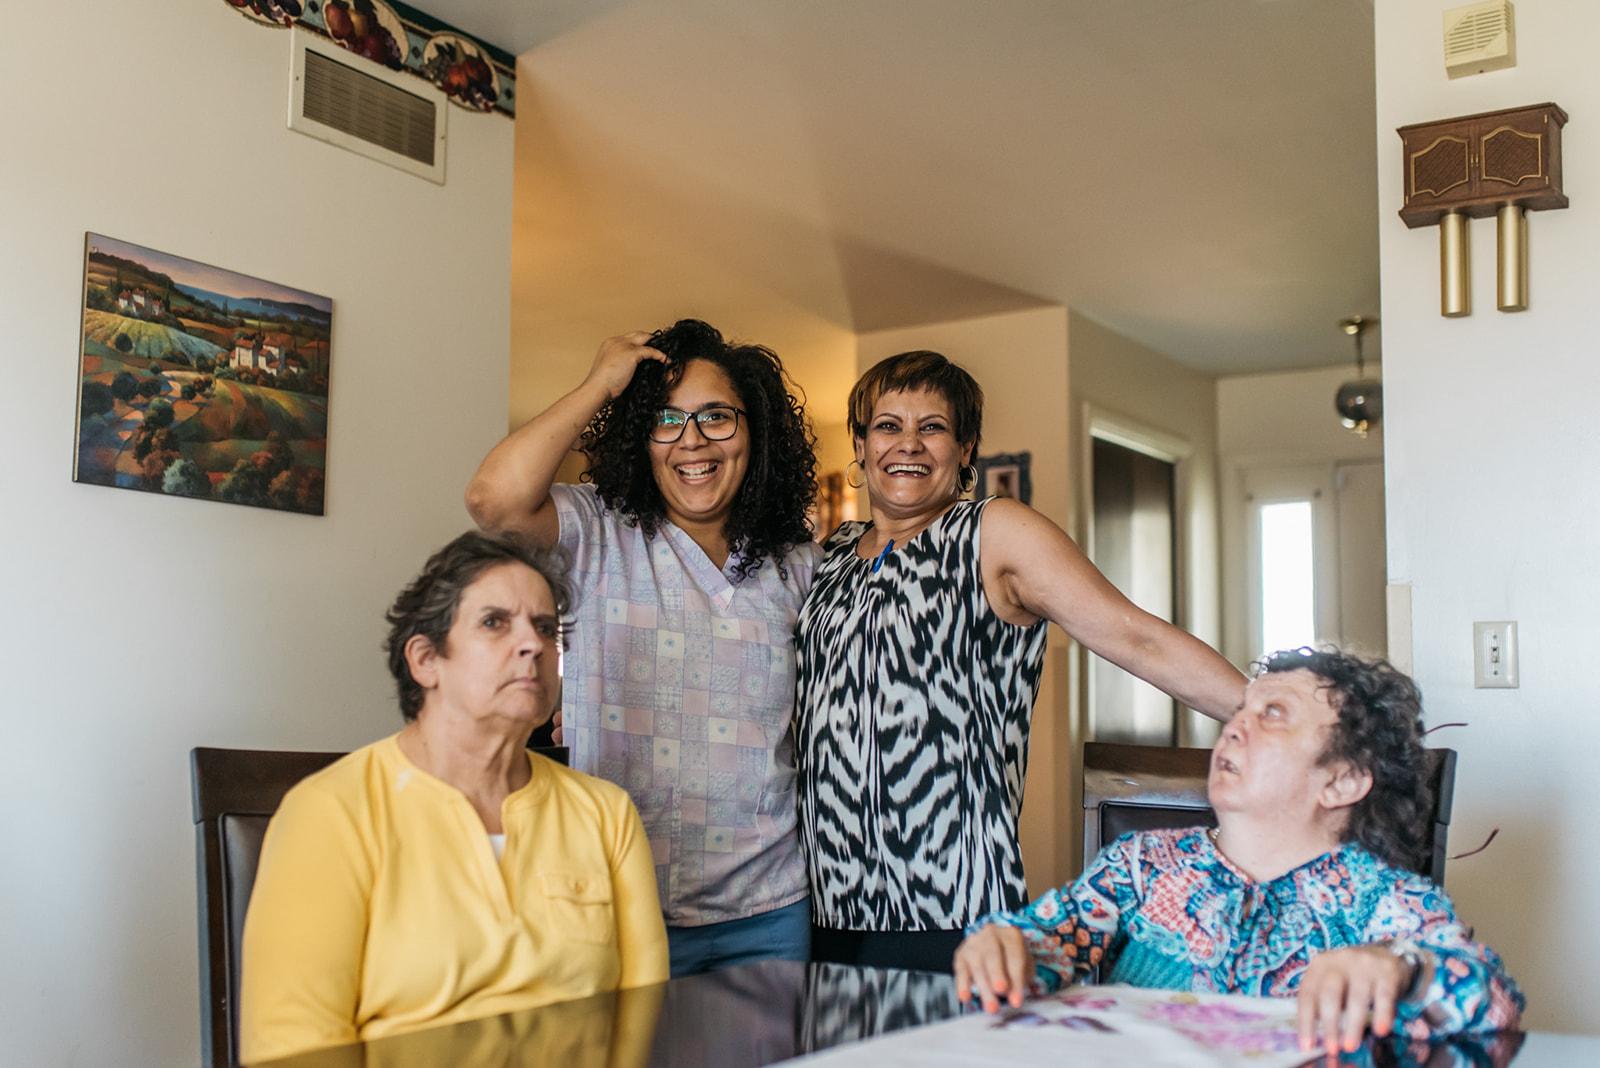 Community Homes in Berks County - Threshold Rehabilitation Services, Inc.